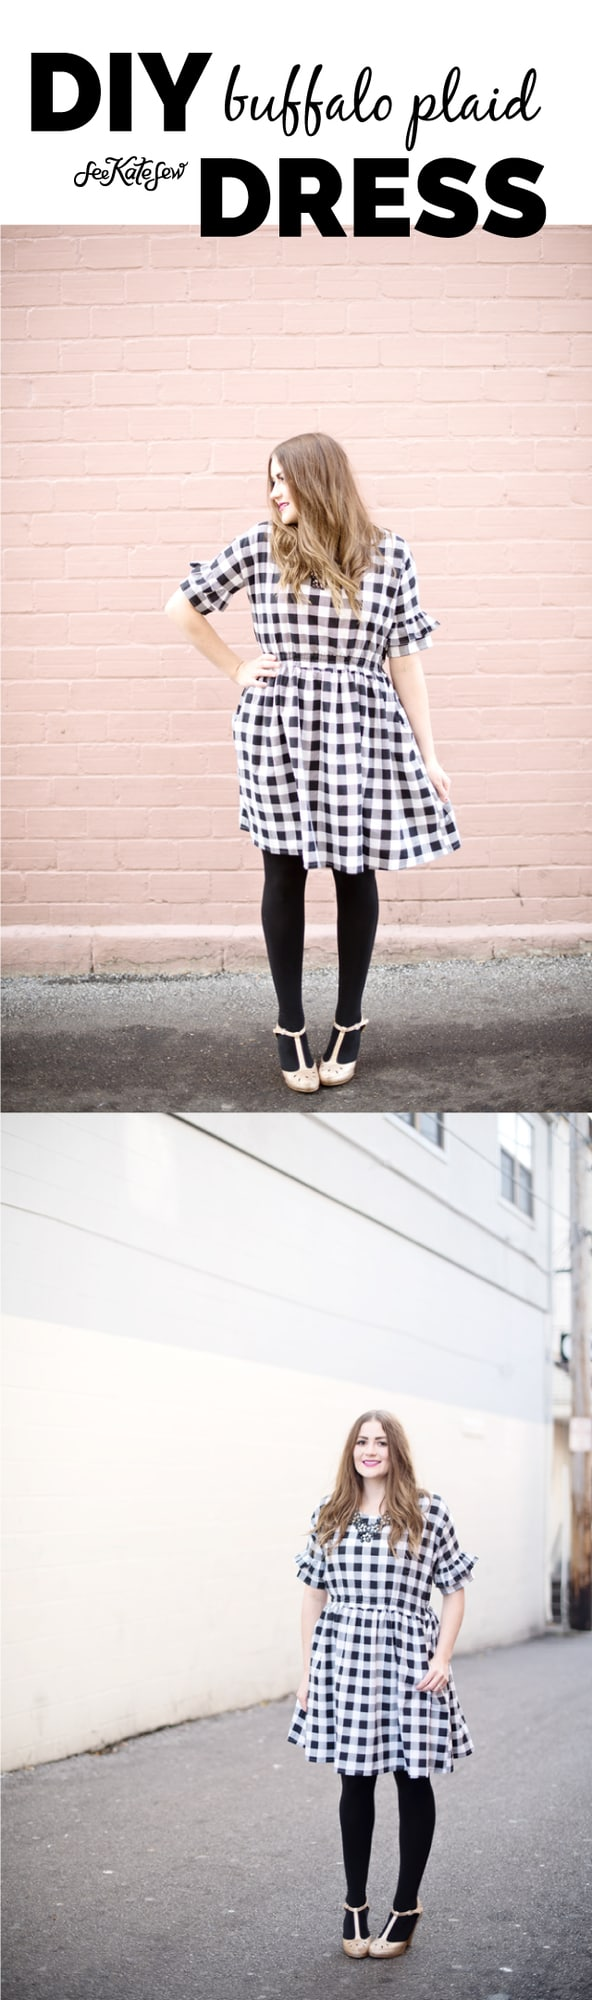 Joann Buffalo Plaid Christmas Dress | buffalo plaid print | diy dress | sewing tips and tricks | dress sewing pattern | handmade dresses | how to sew a buffalo plaid dress || See Kate Sew #buffaloplaid #diydress #sewingtips